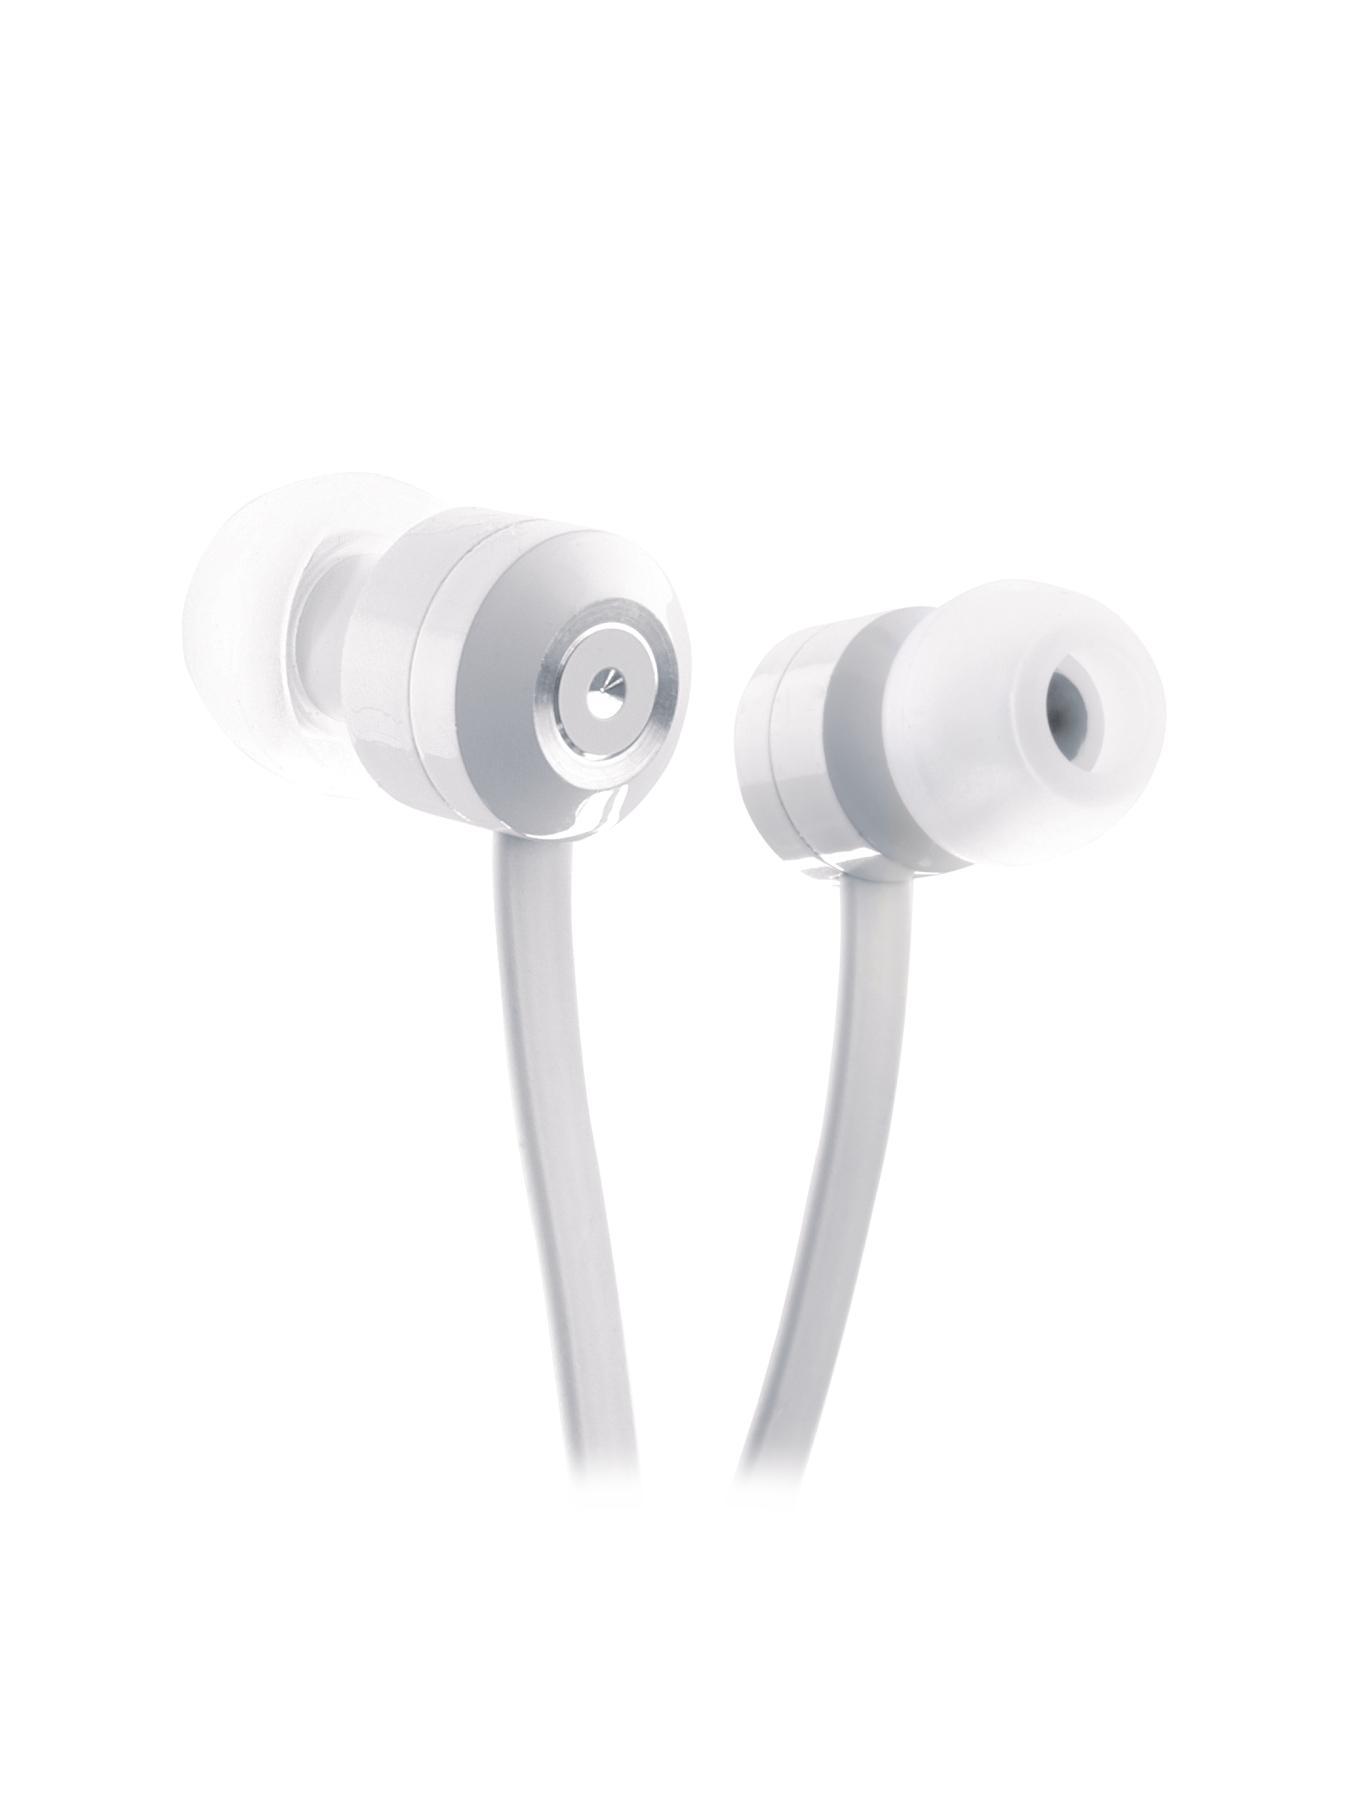 Kitsound Ribbons Earphones - White